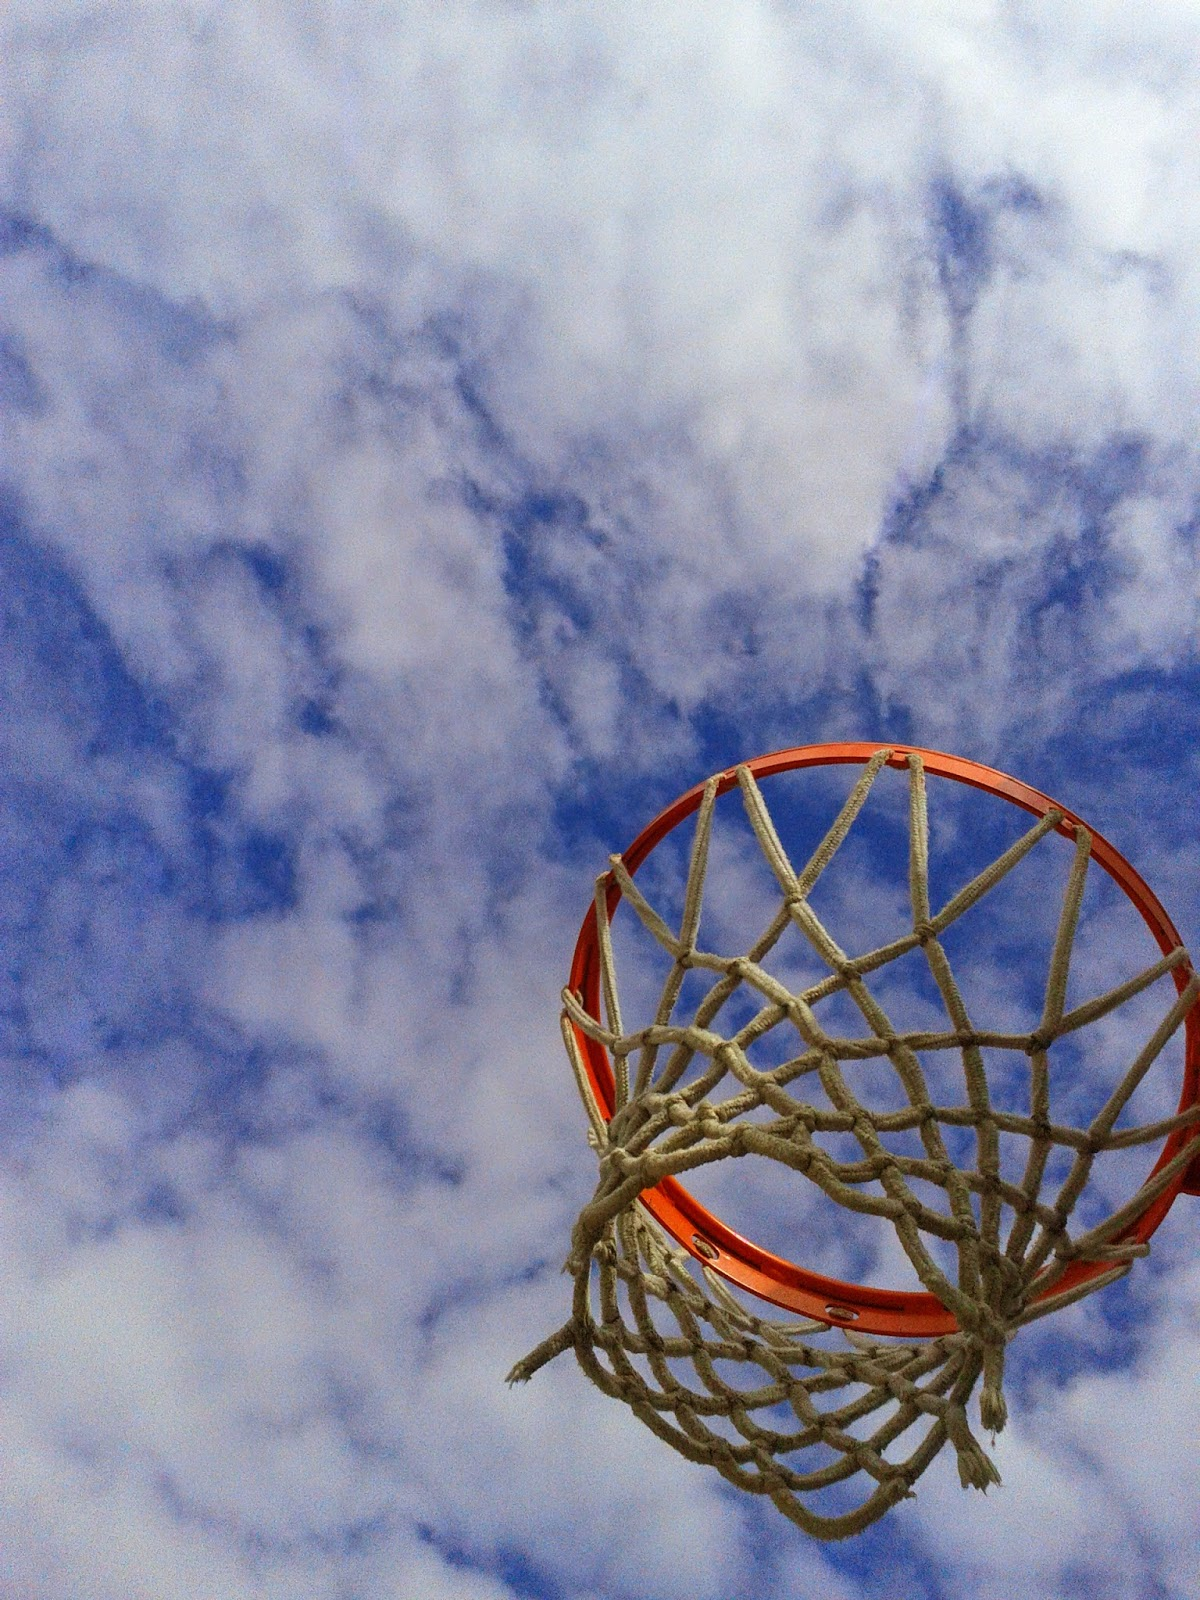 Basketball net rim amongst the blue sky and clouds